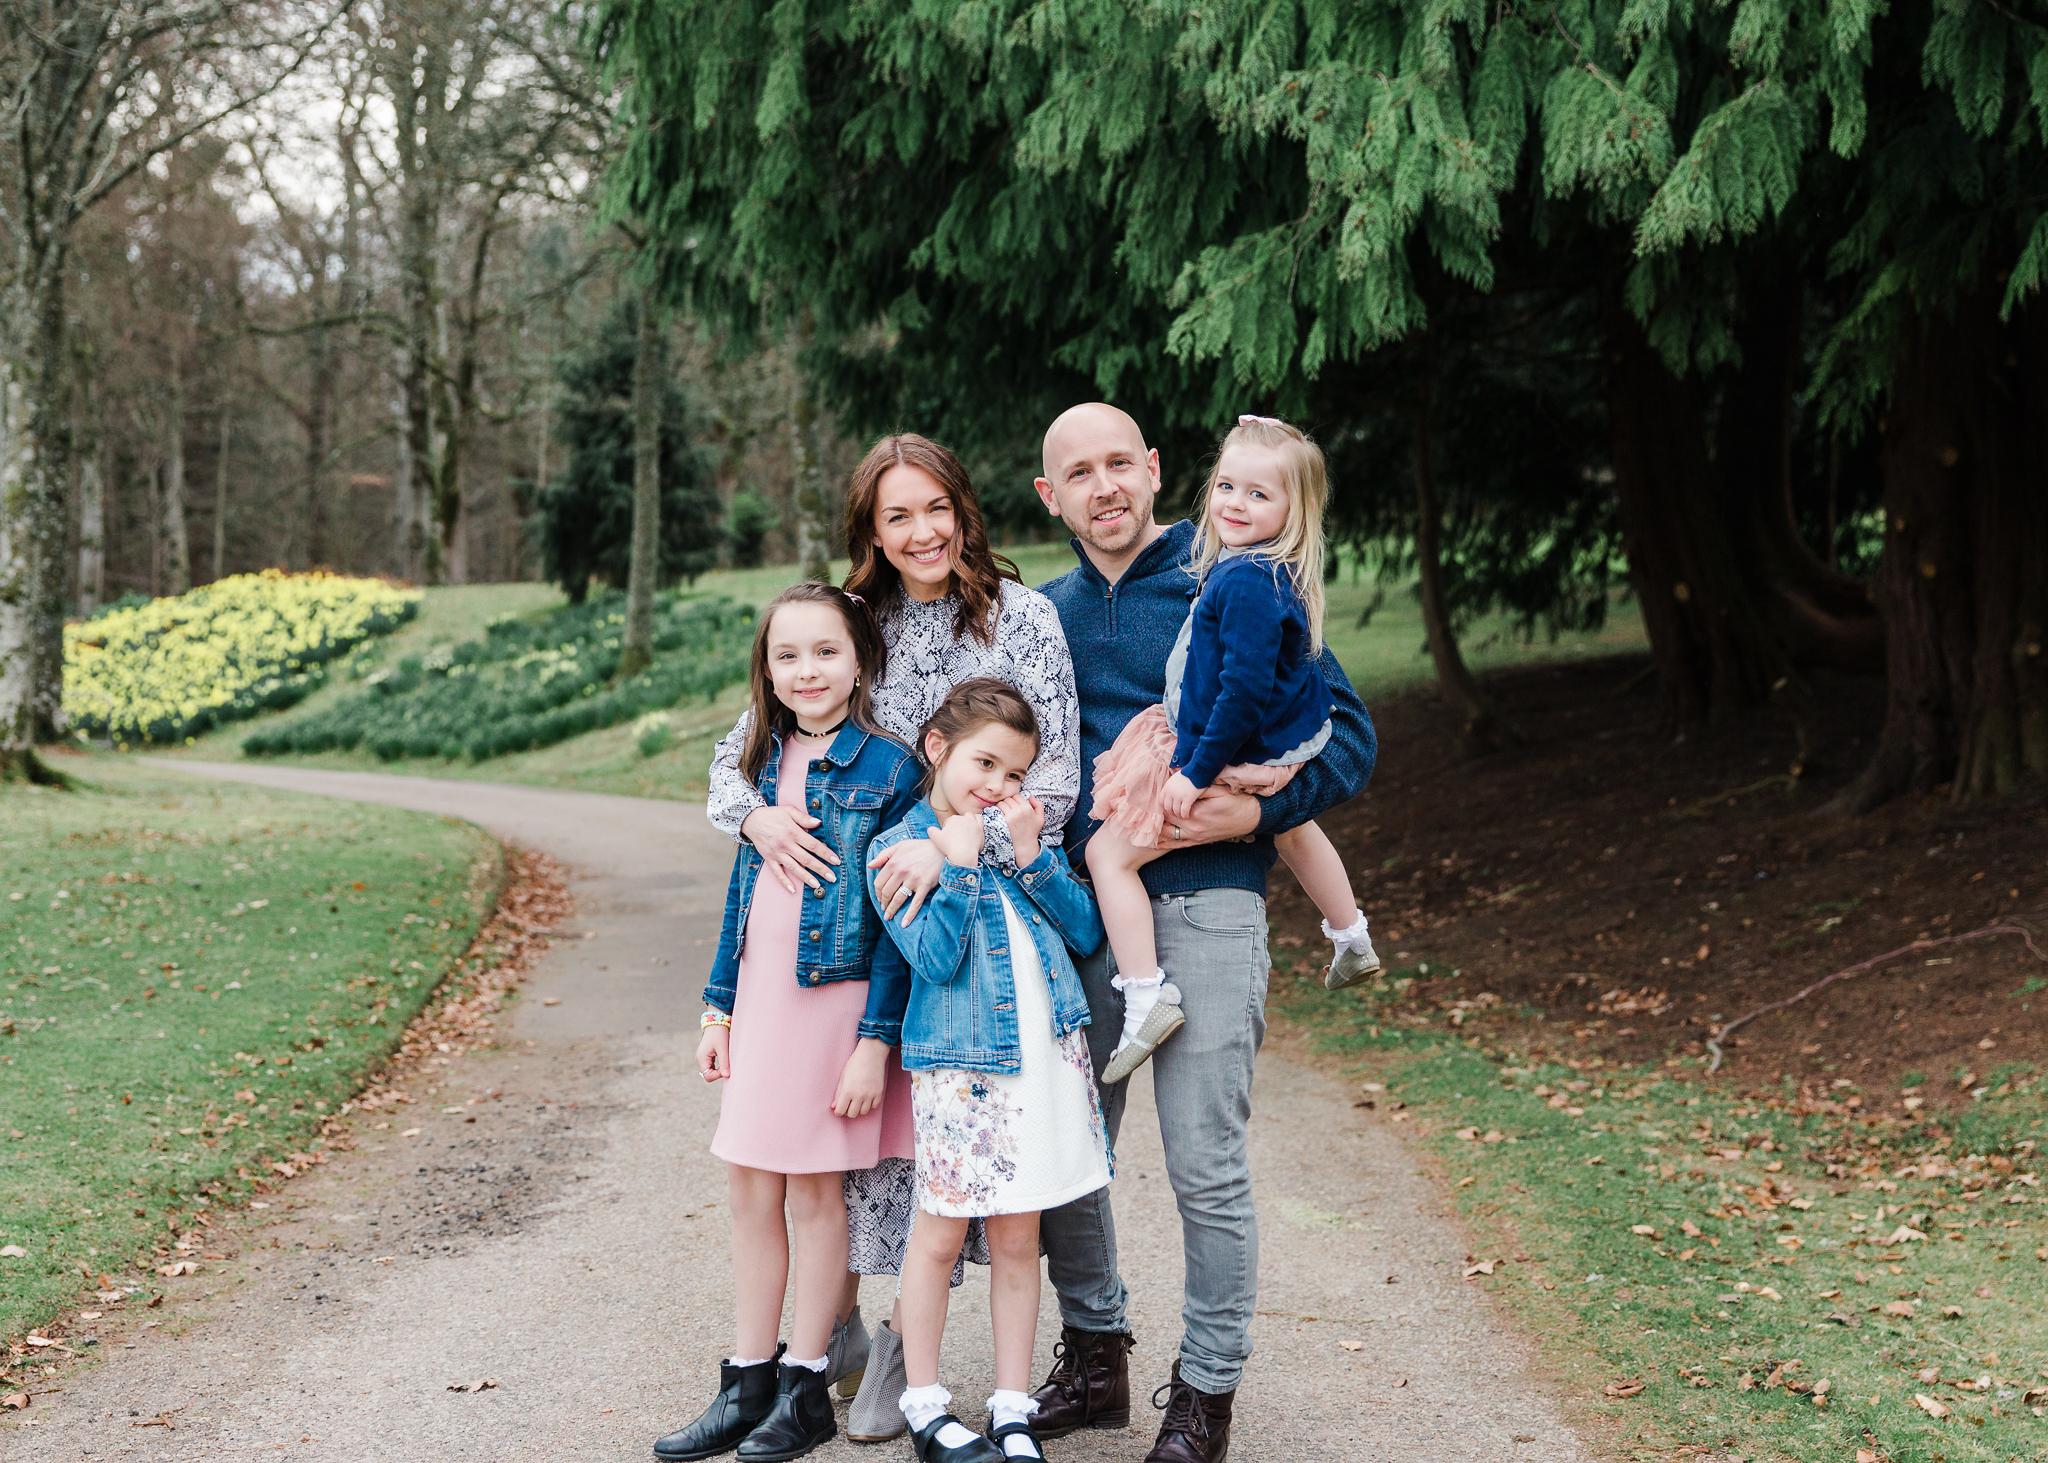 aberdeen family photographer banchory photographer